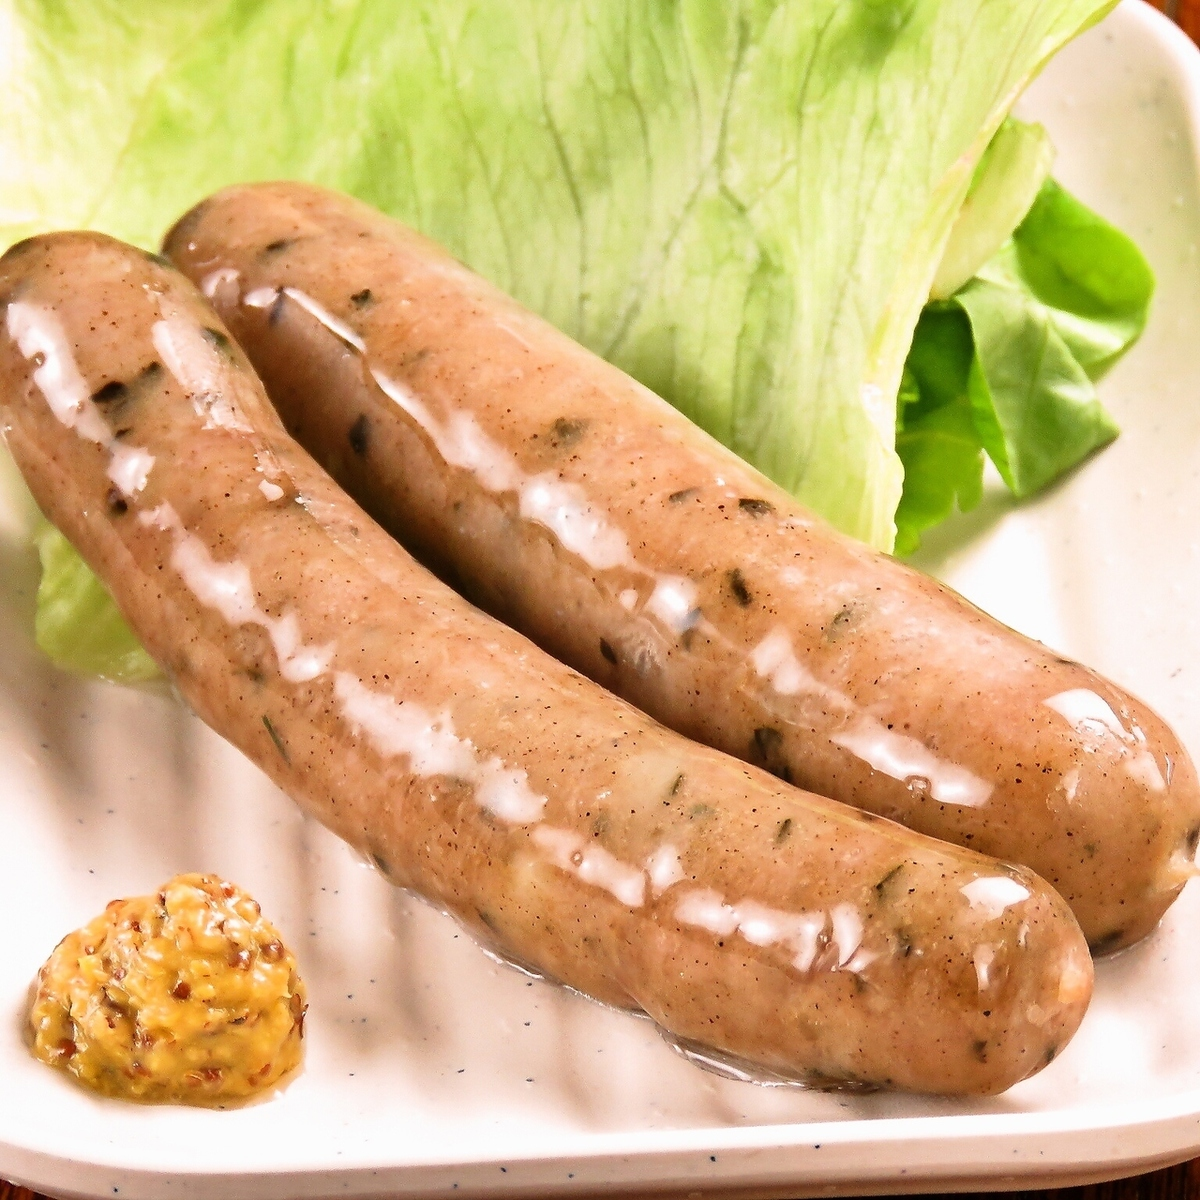 Okinawa-made au-boil boiled herb sausage